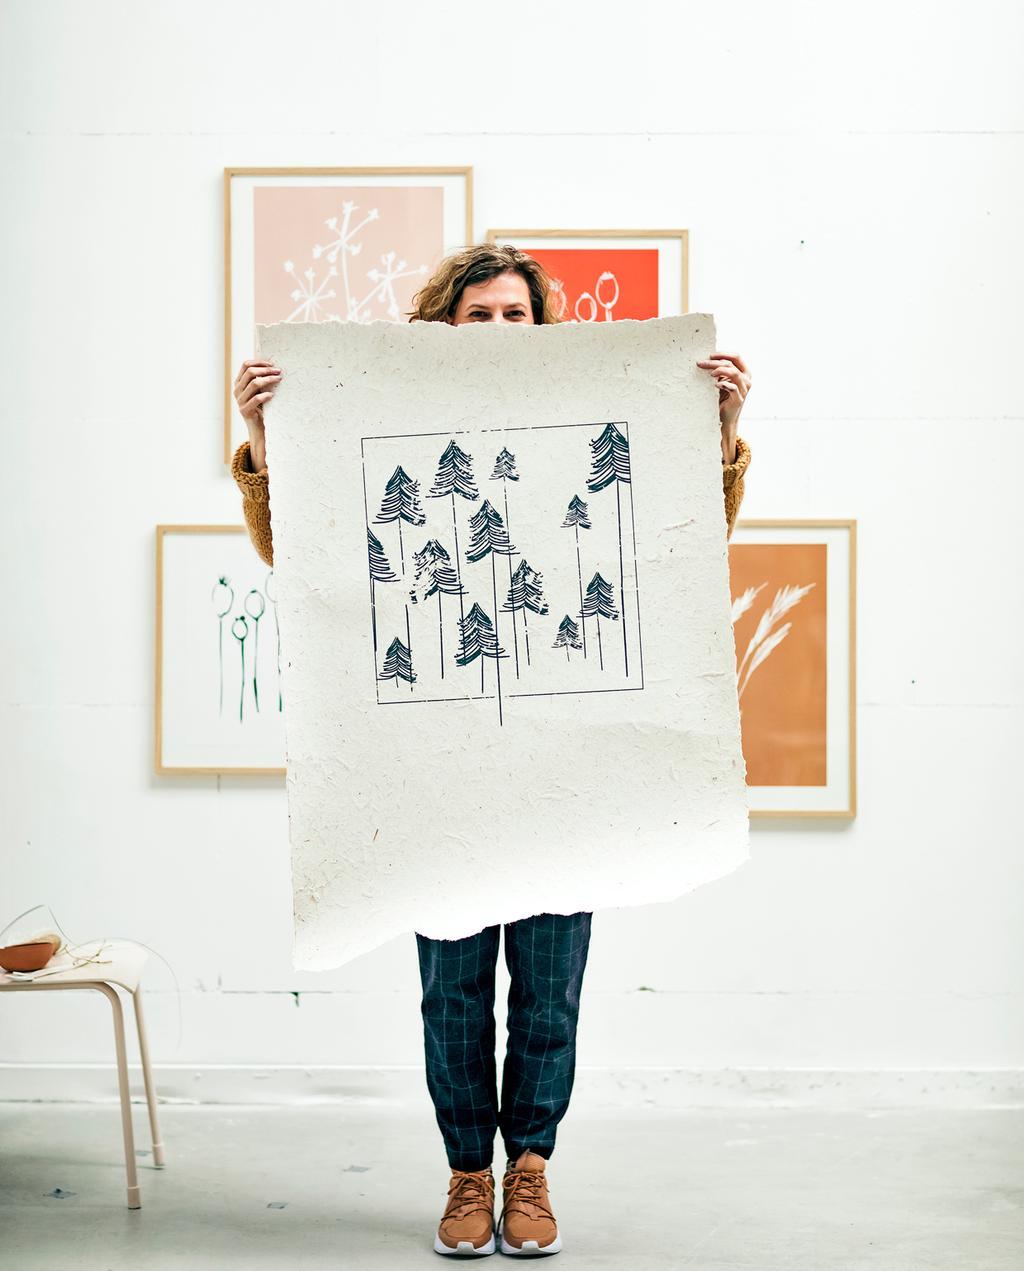 vtwonen 4-2019 | Ambacht papier sjablonen portret